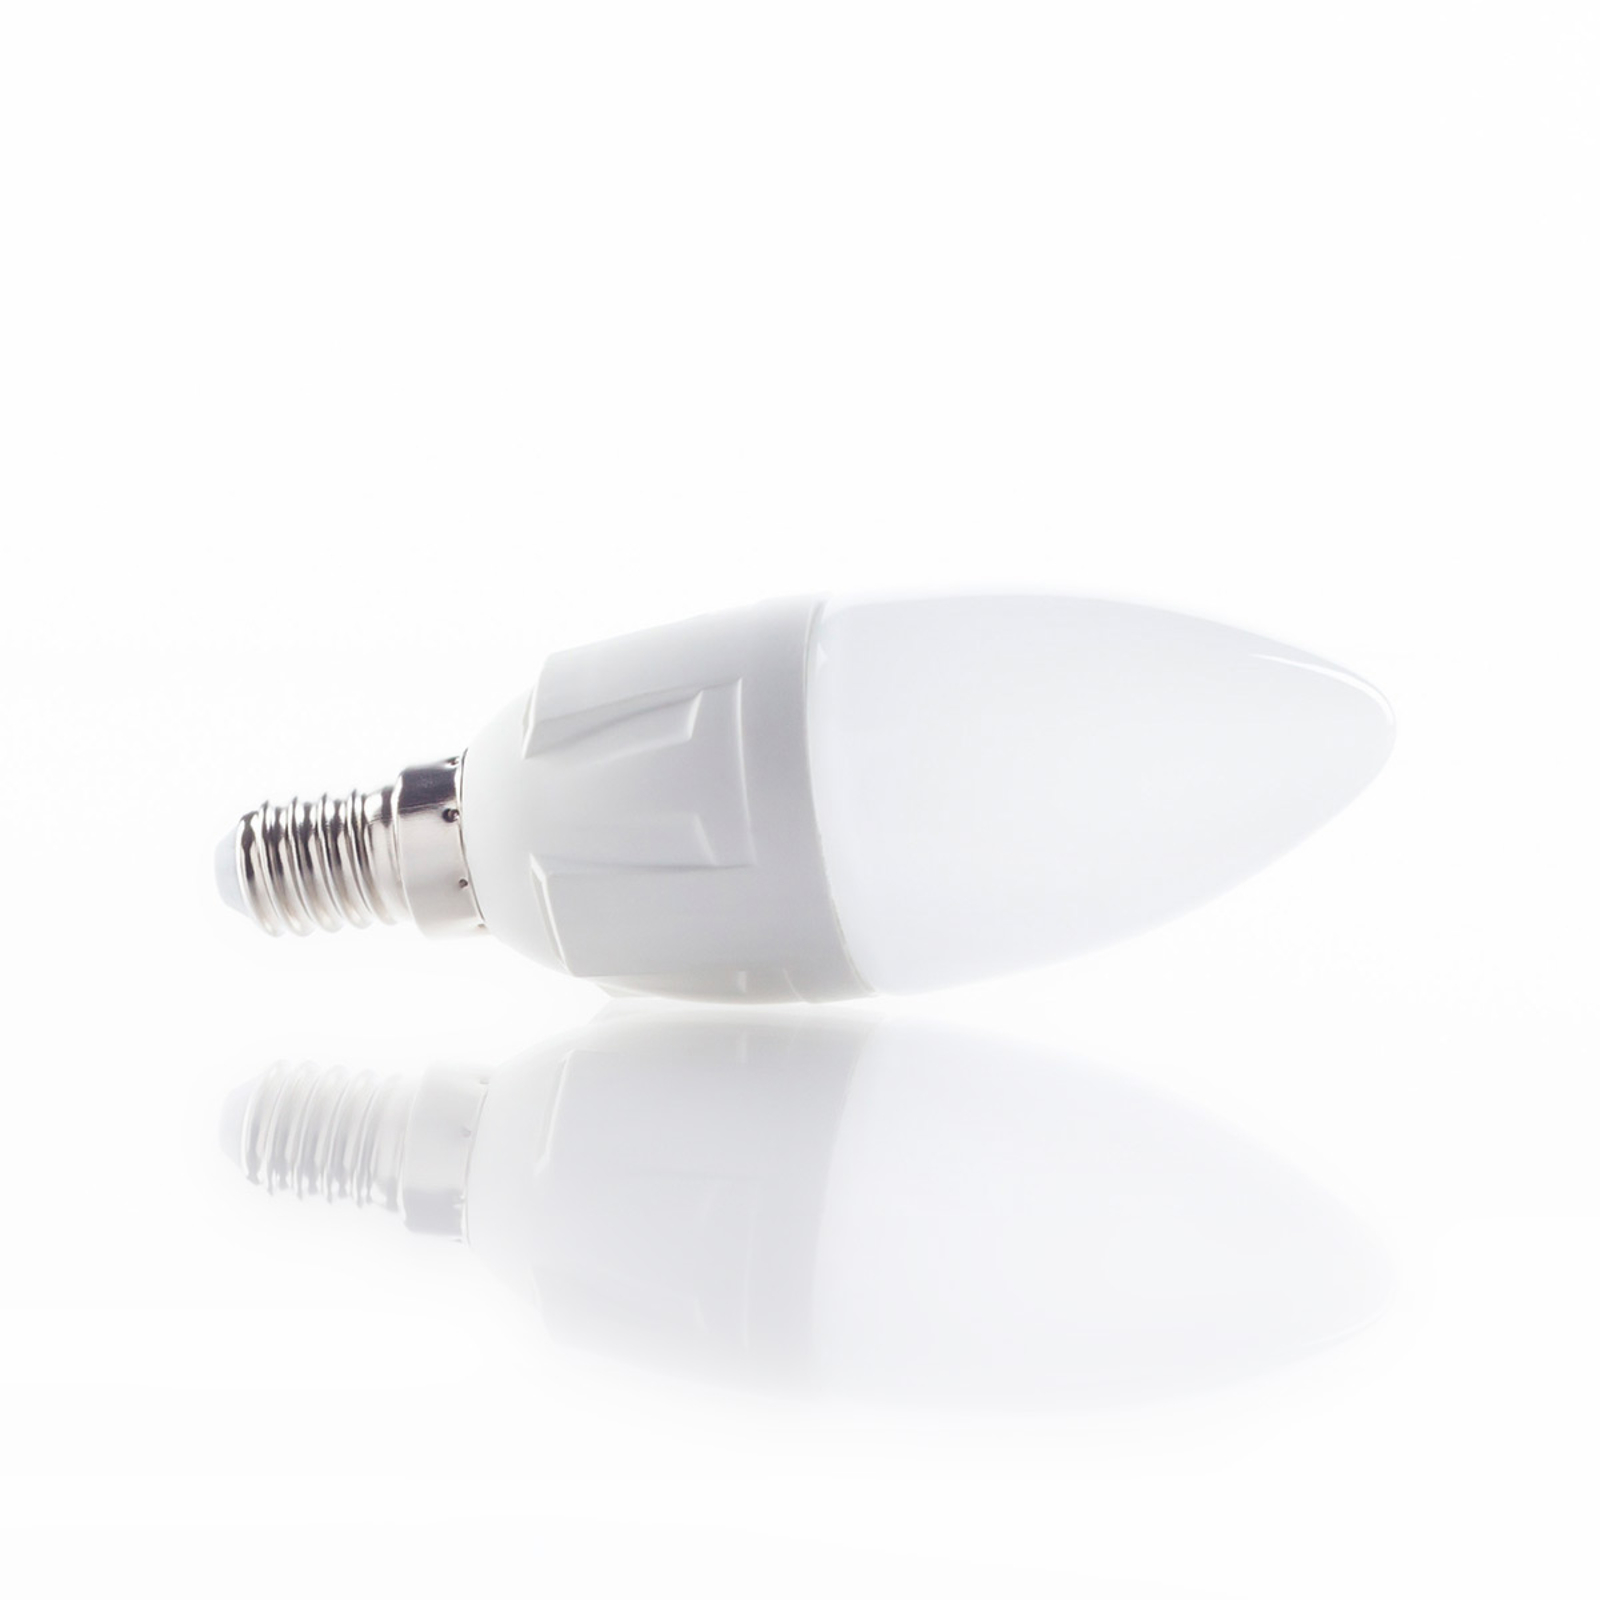 E14 6W LED-pære med form som stearinlys,varmhvid